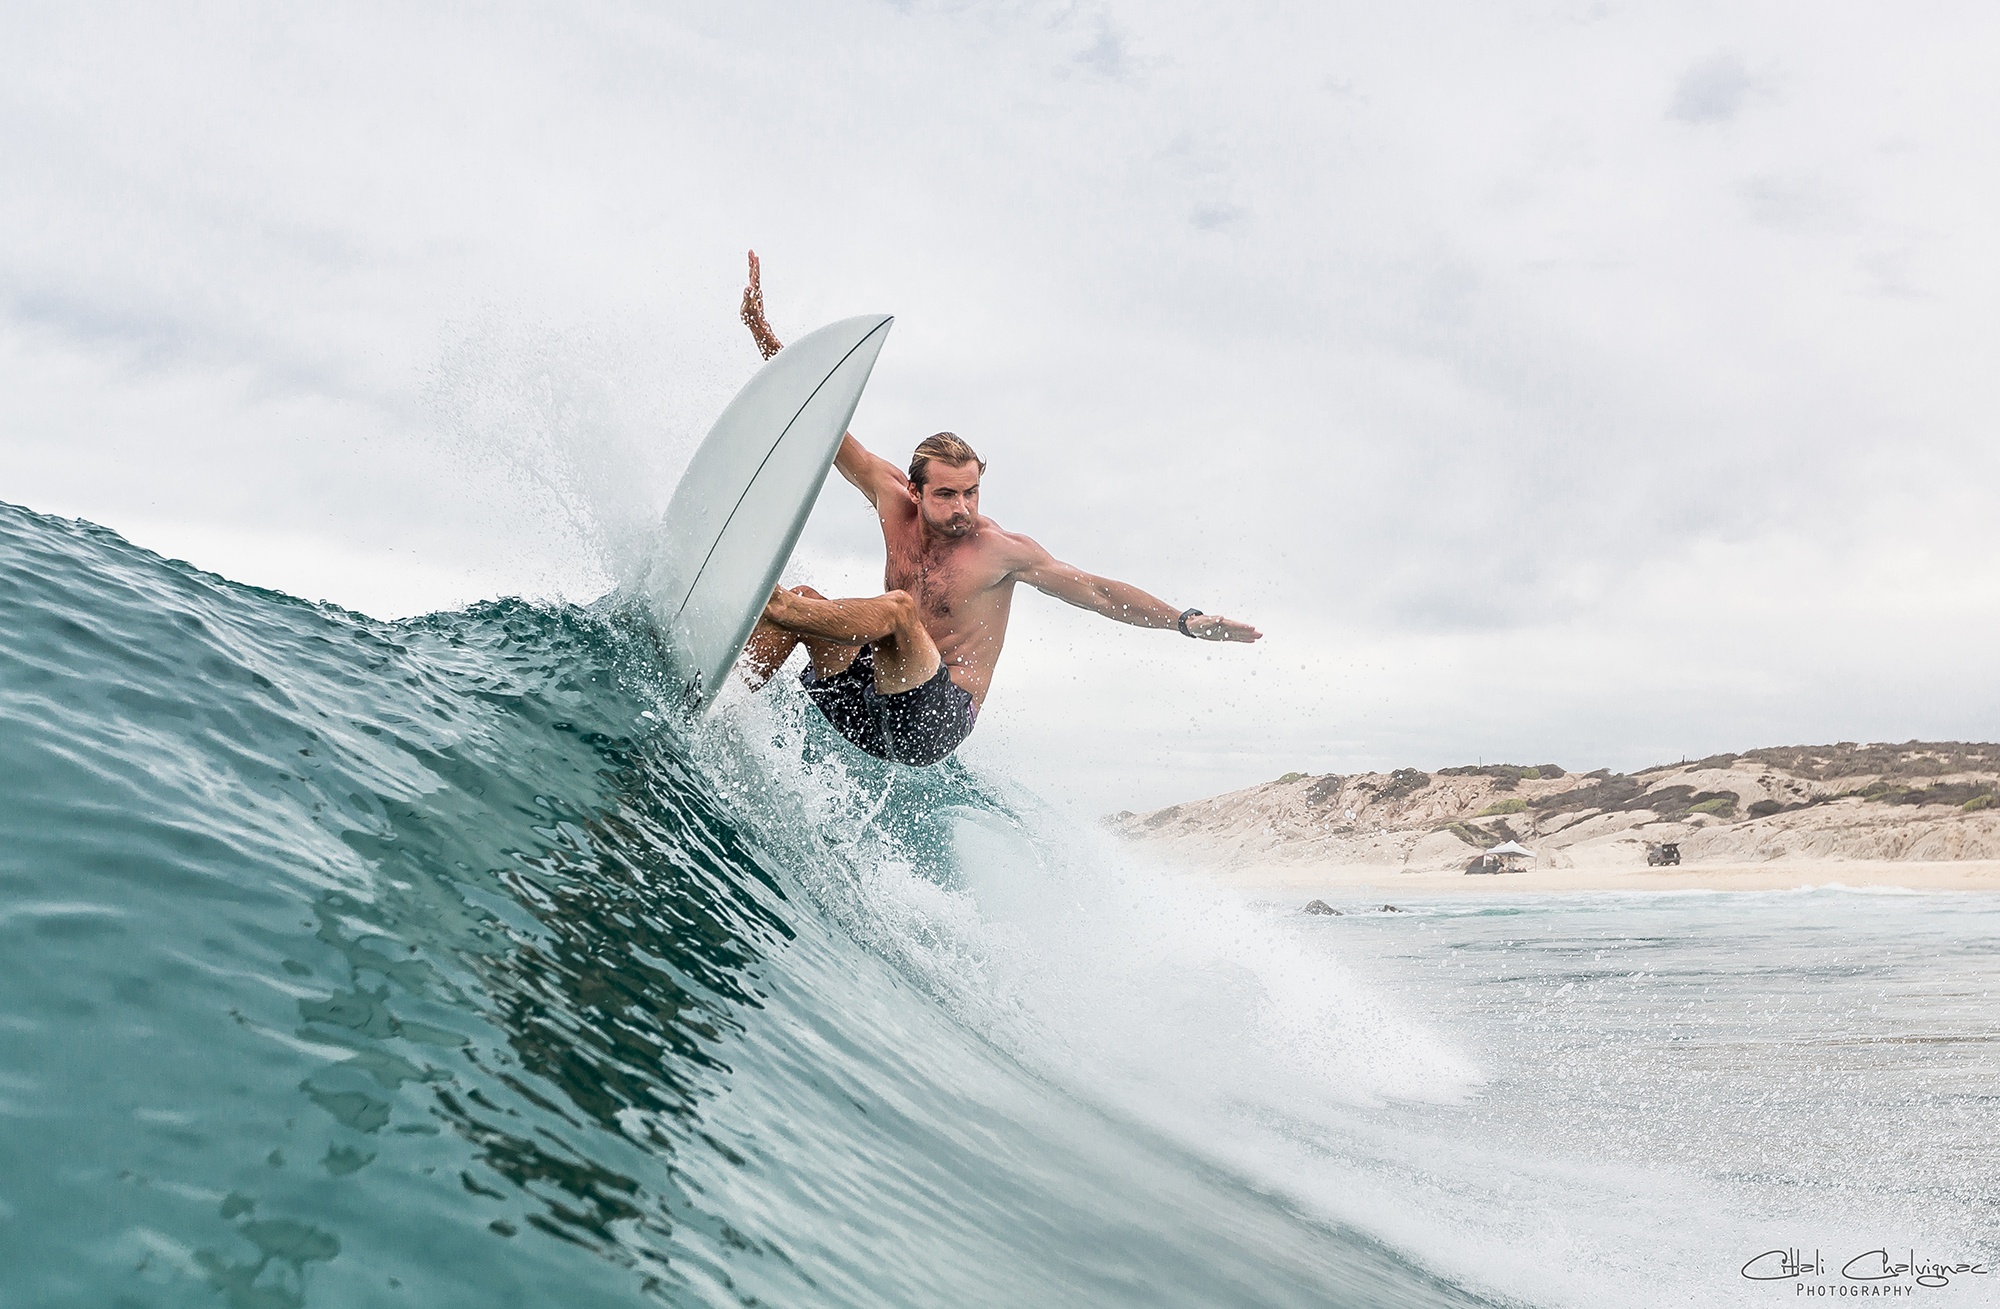 Foto Surfista Inicio Citlali Chalvignac